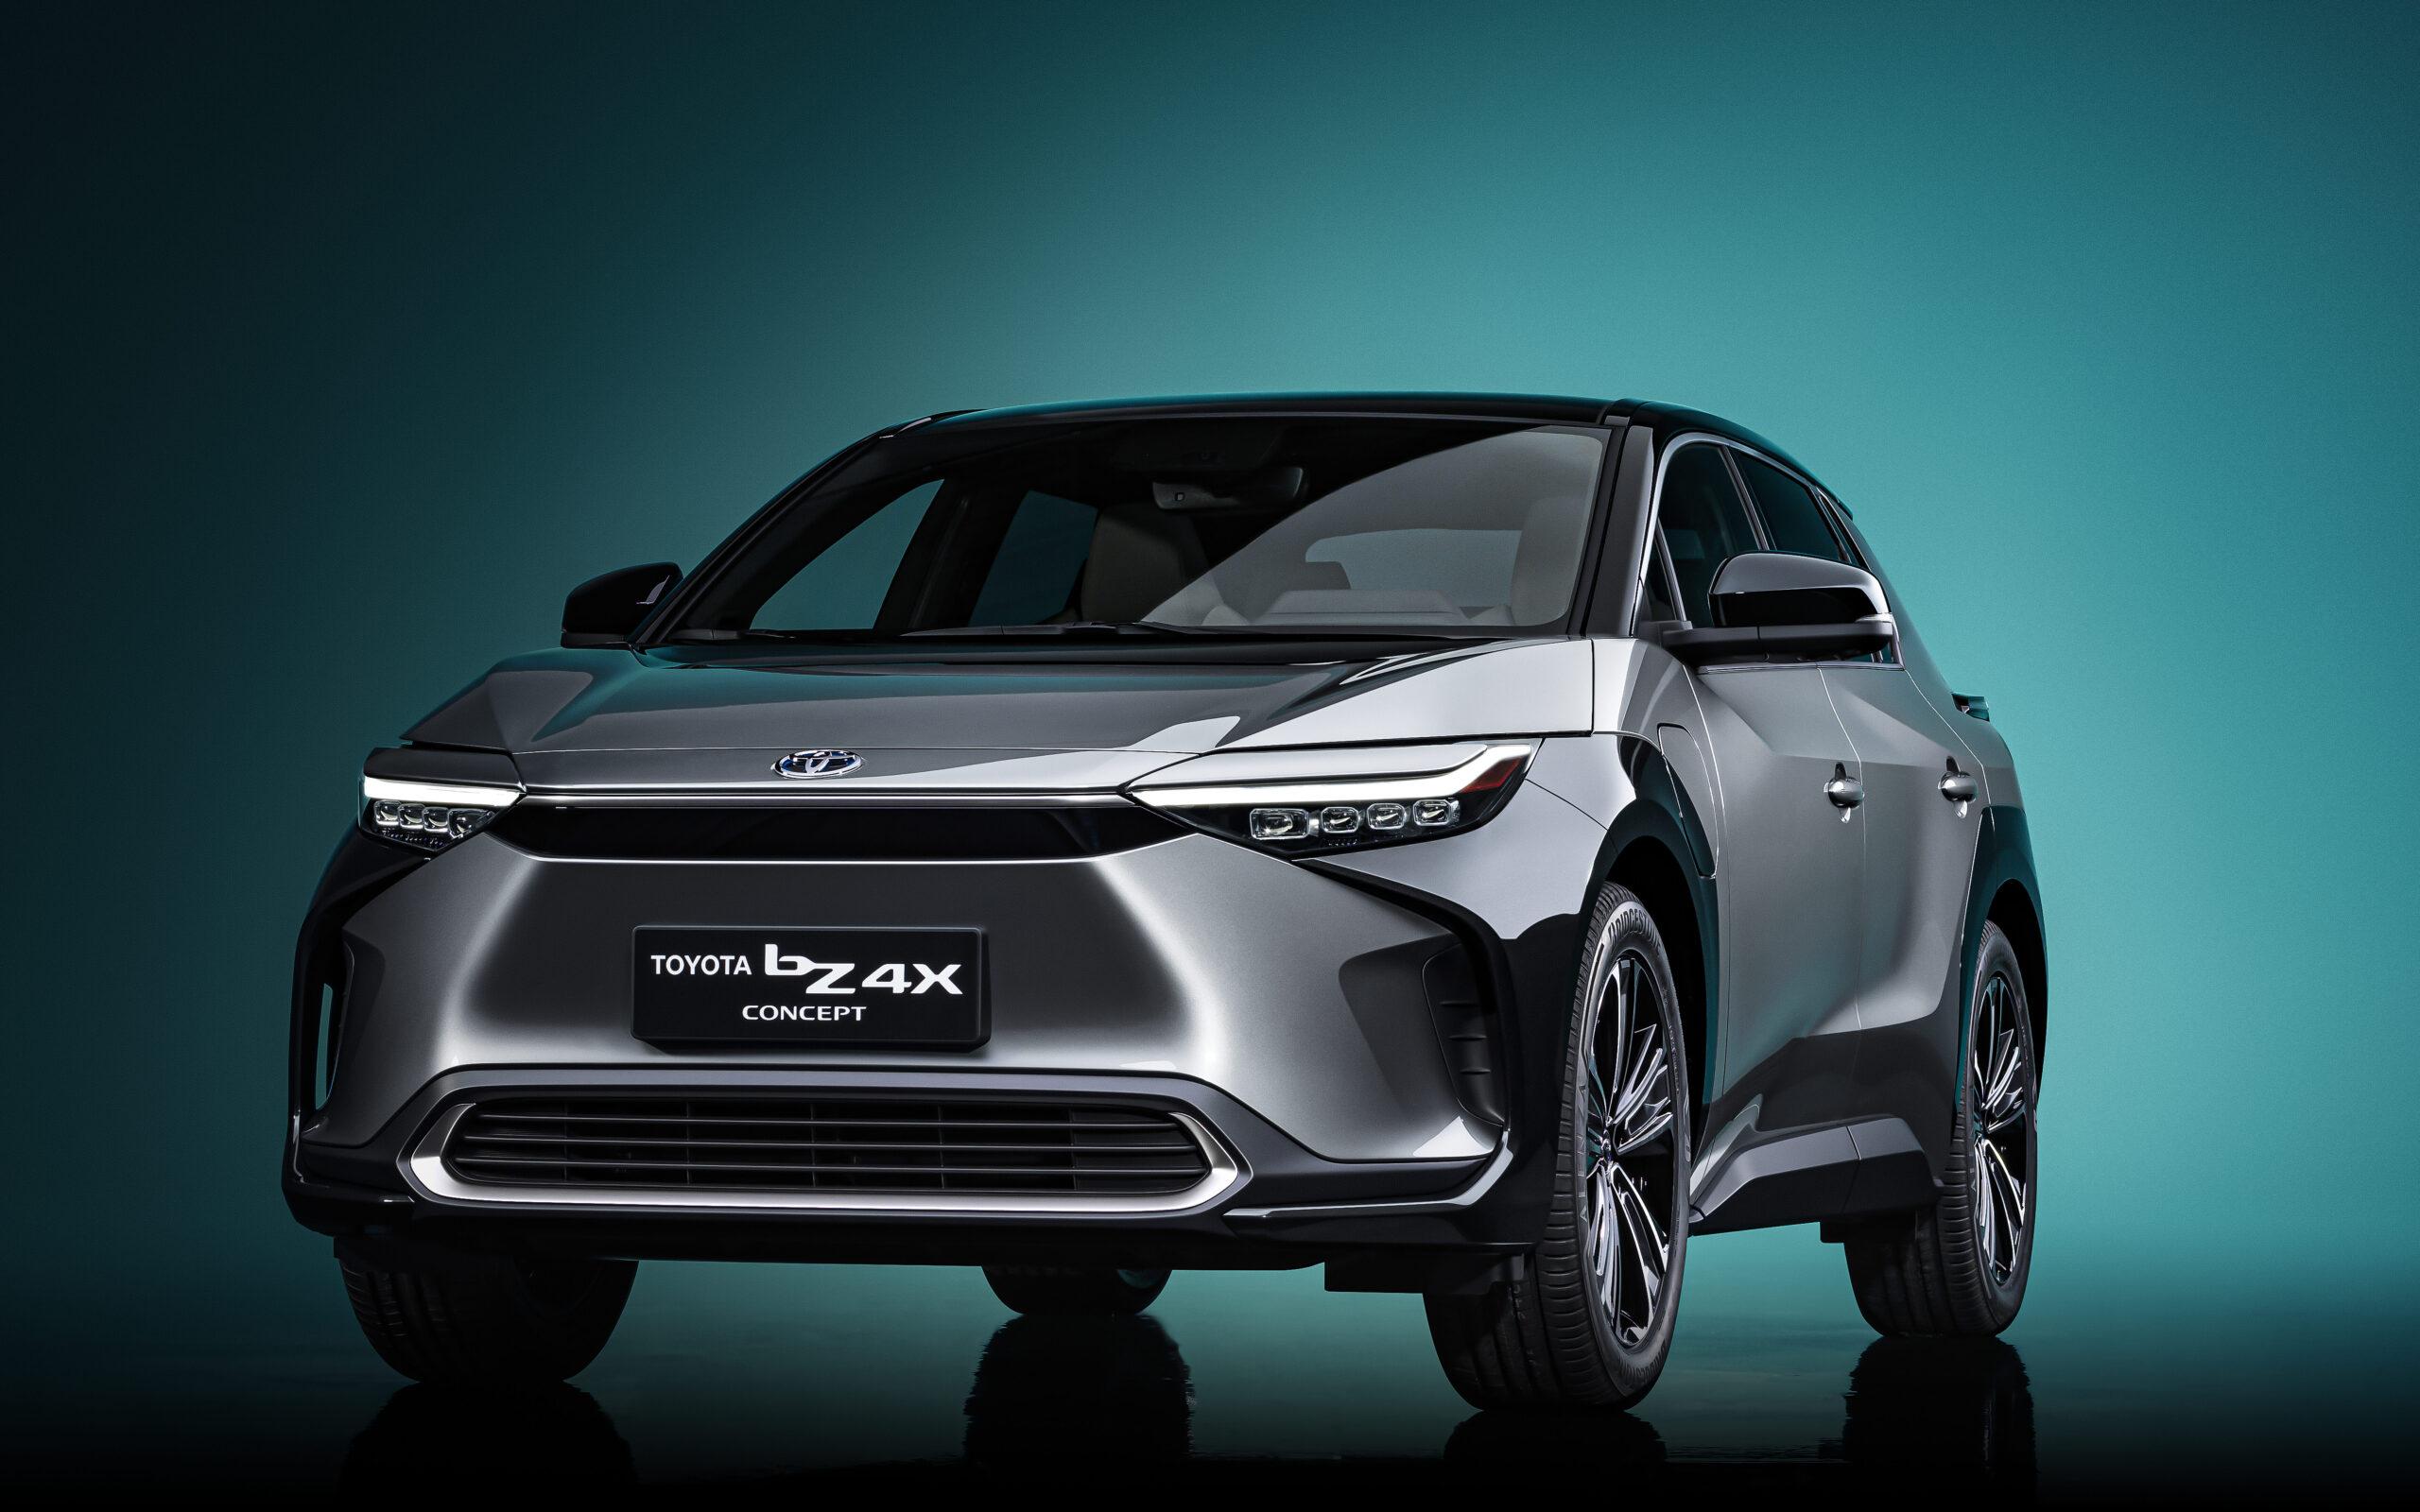 Toyota bZ4X concept avanti tre quarti